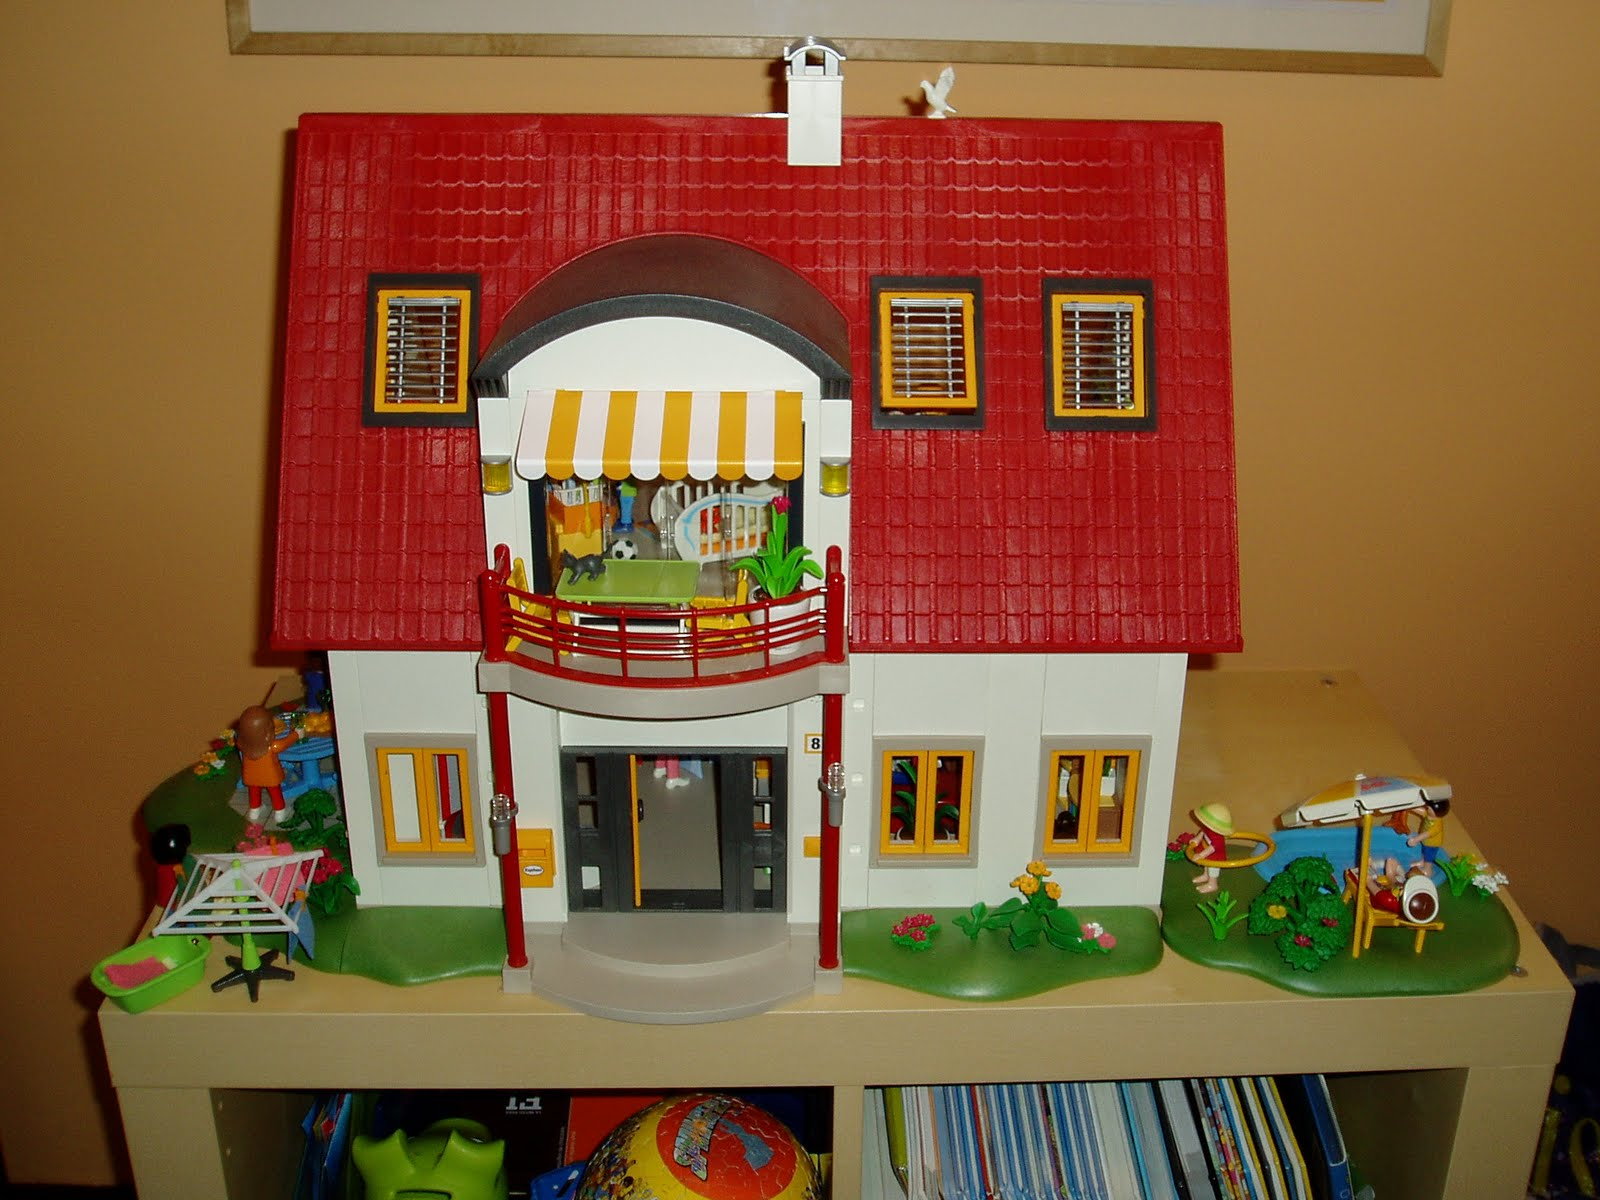 Rodriplay casa moderna al reves de playmobil for Casa moderna playmobil